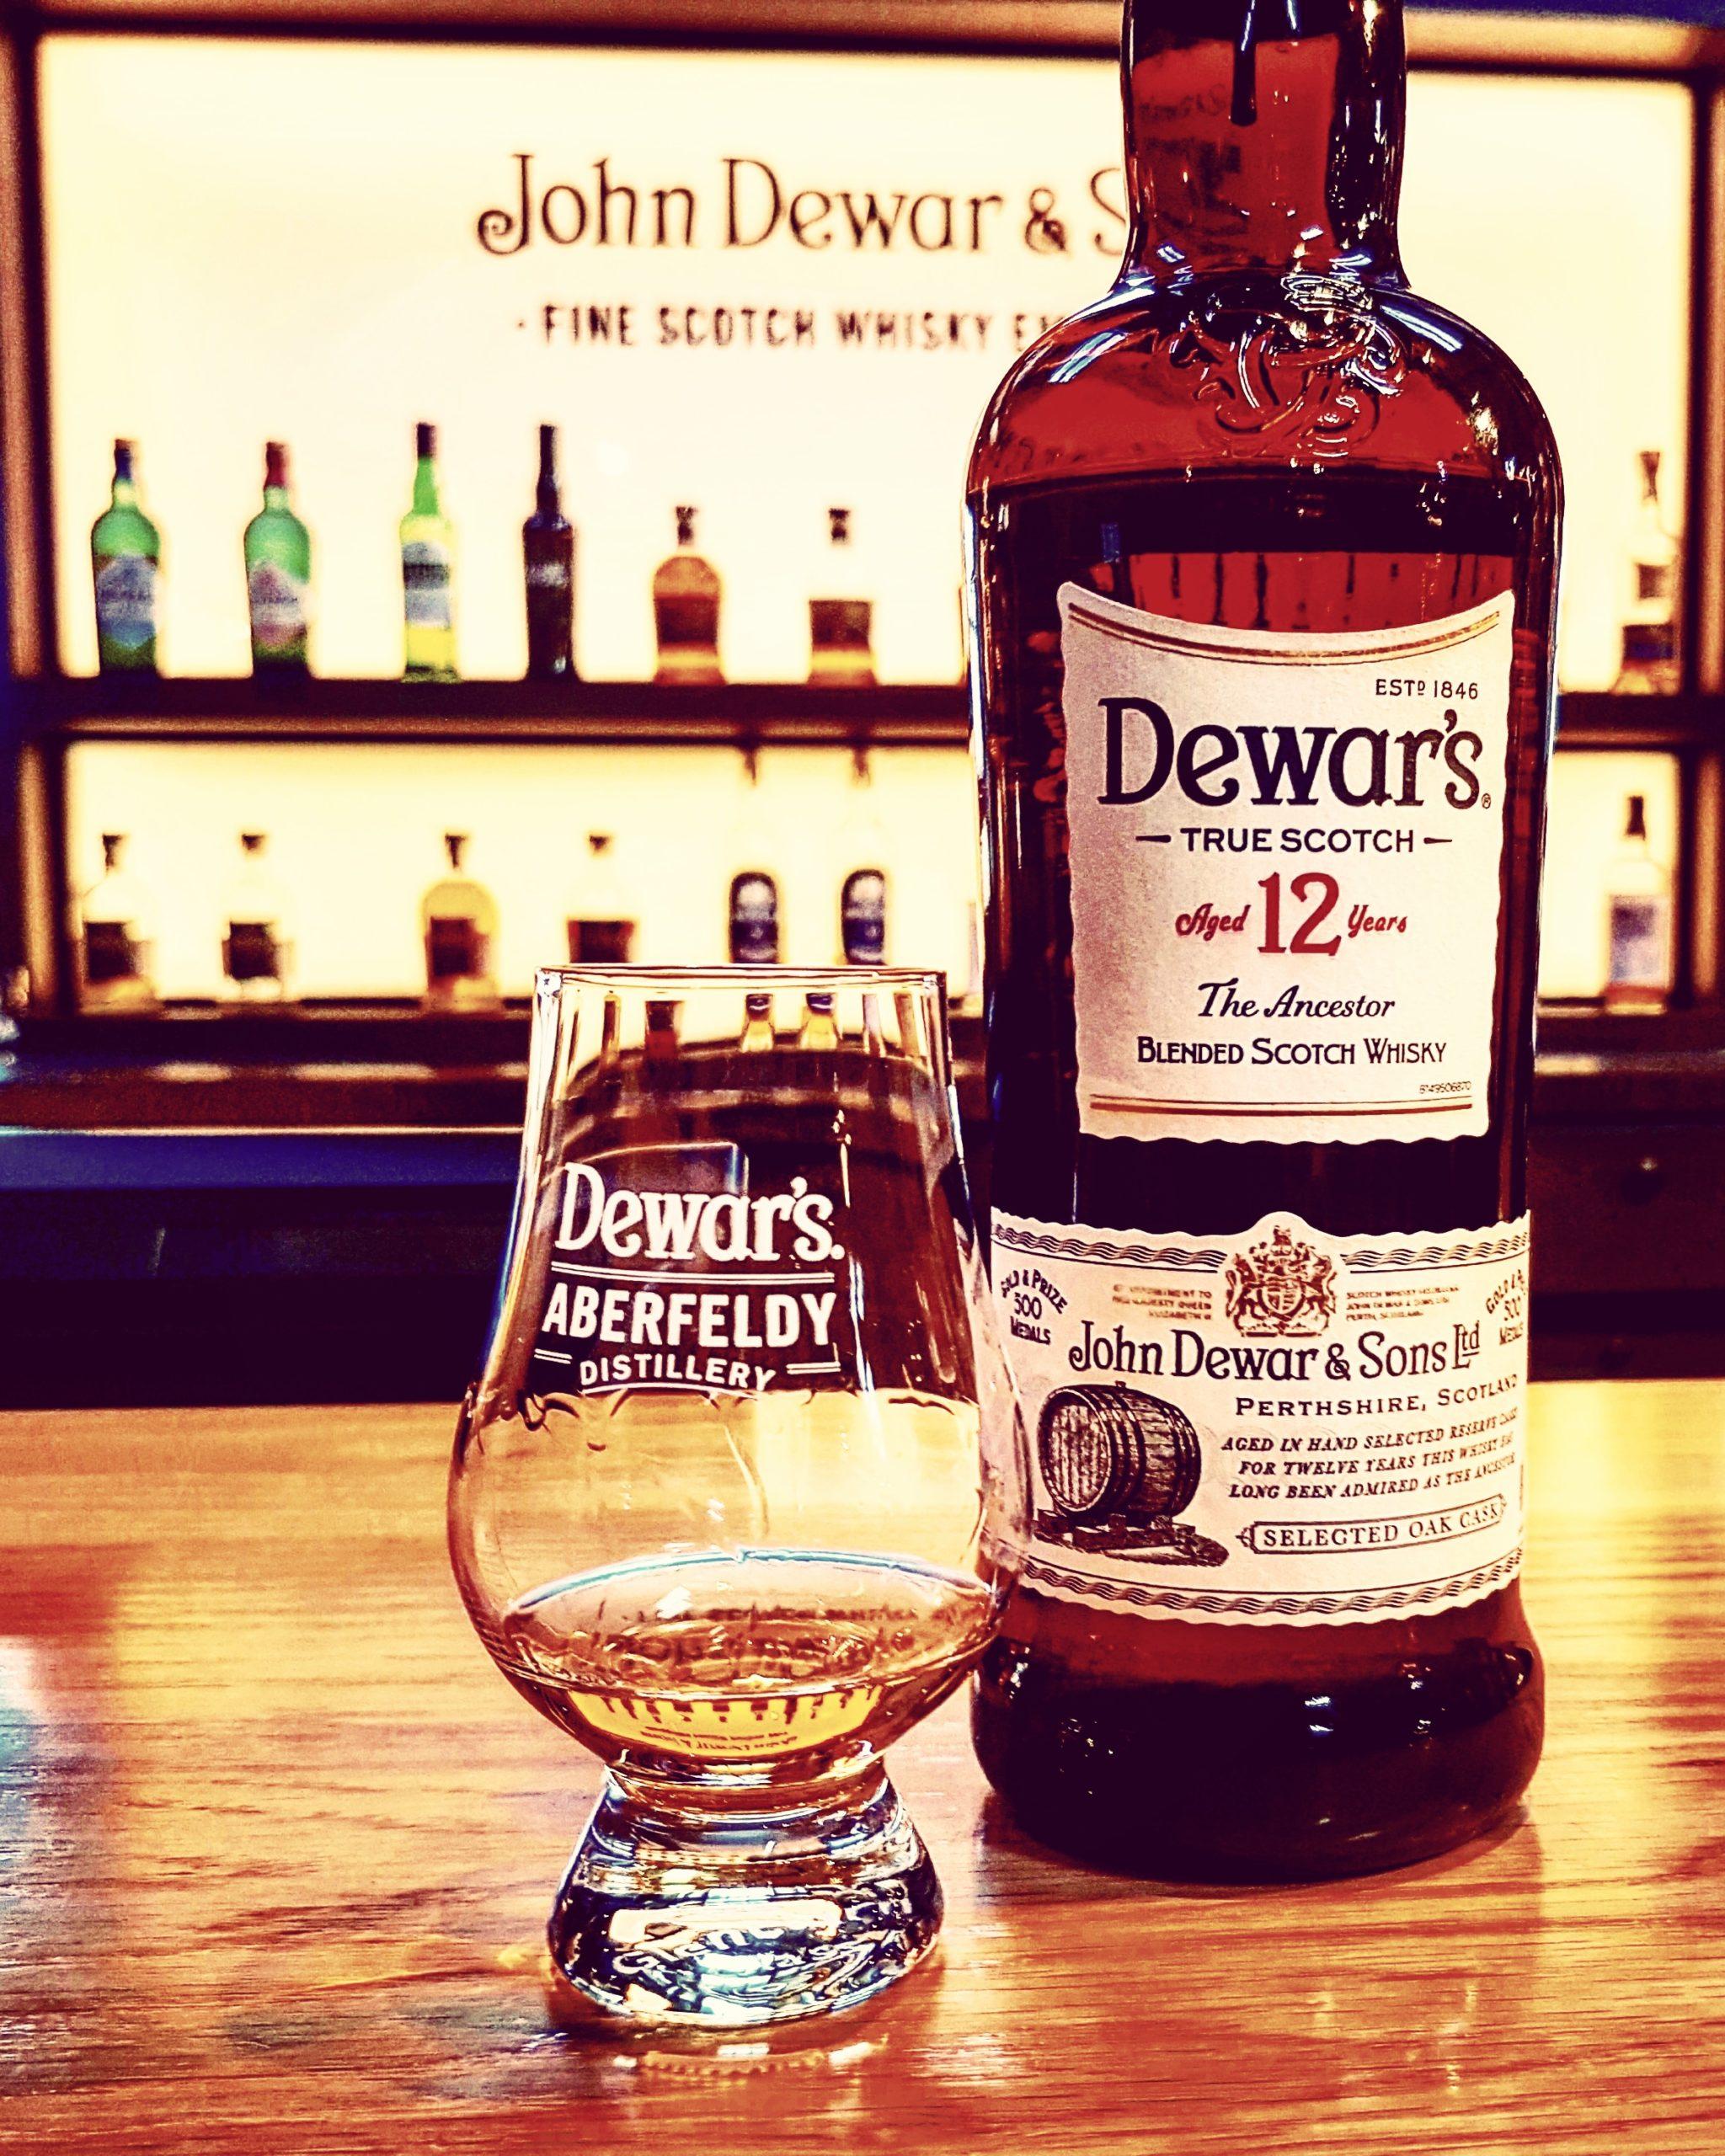 Dewars 12 Jahre Blended Scotch Whisky